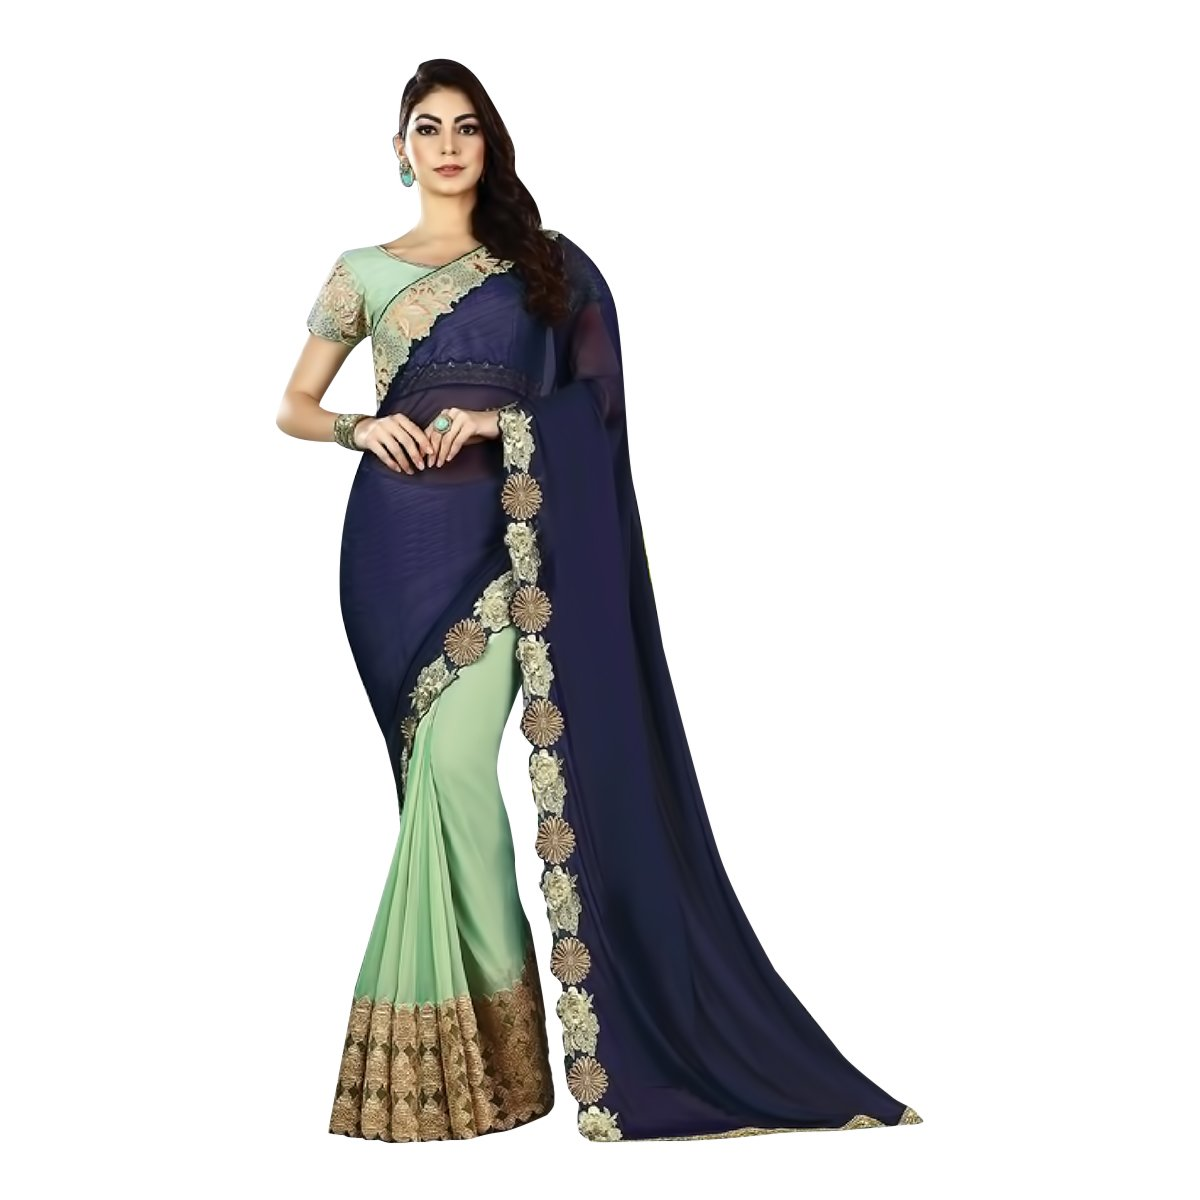 Designer RichLook Party Wear Indian Saree Wedding Bridal Suit Lehenga Women Dress 506